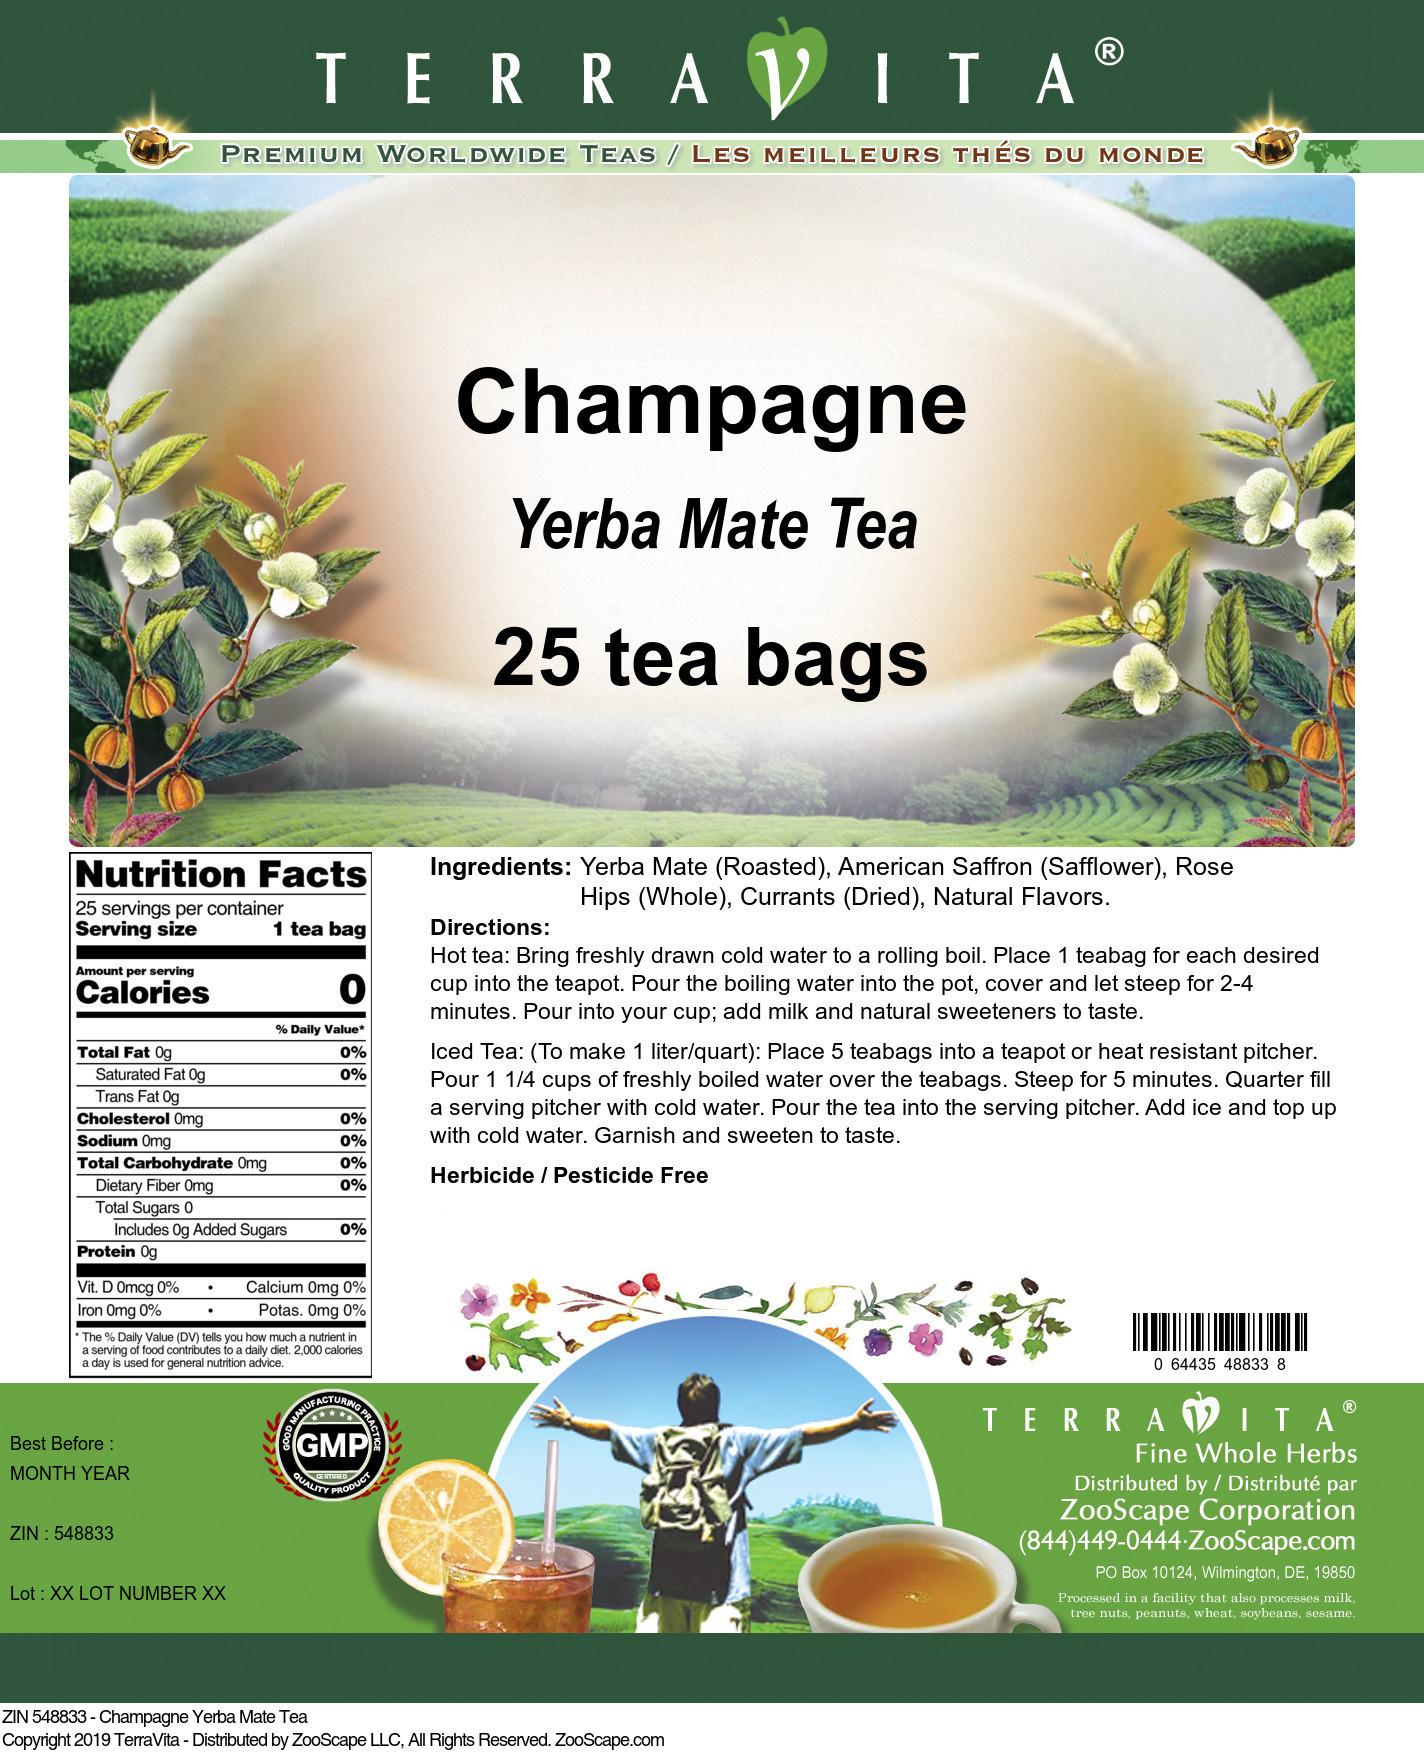 Champagne Yerba Mate Tea